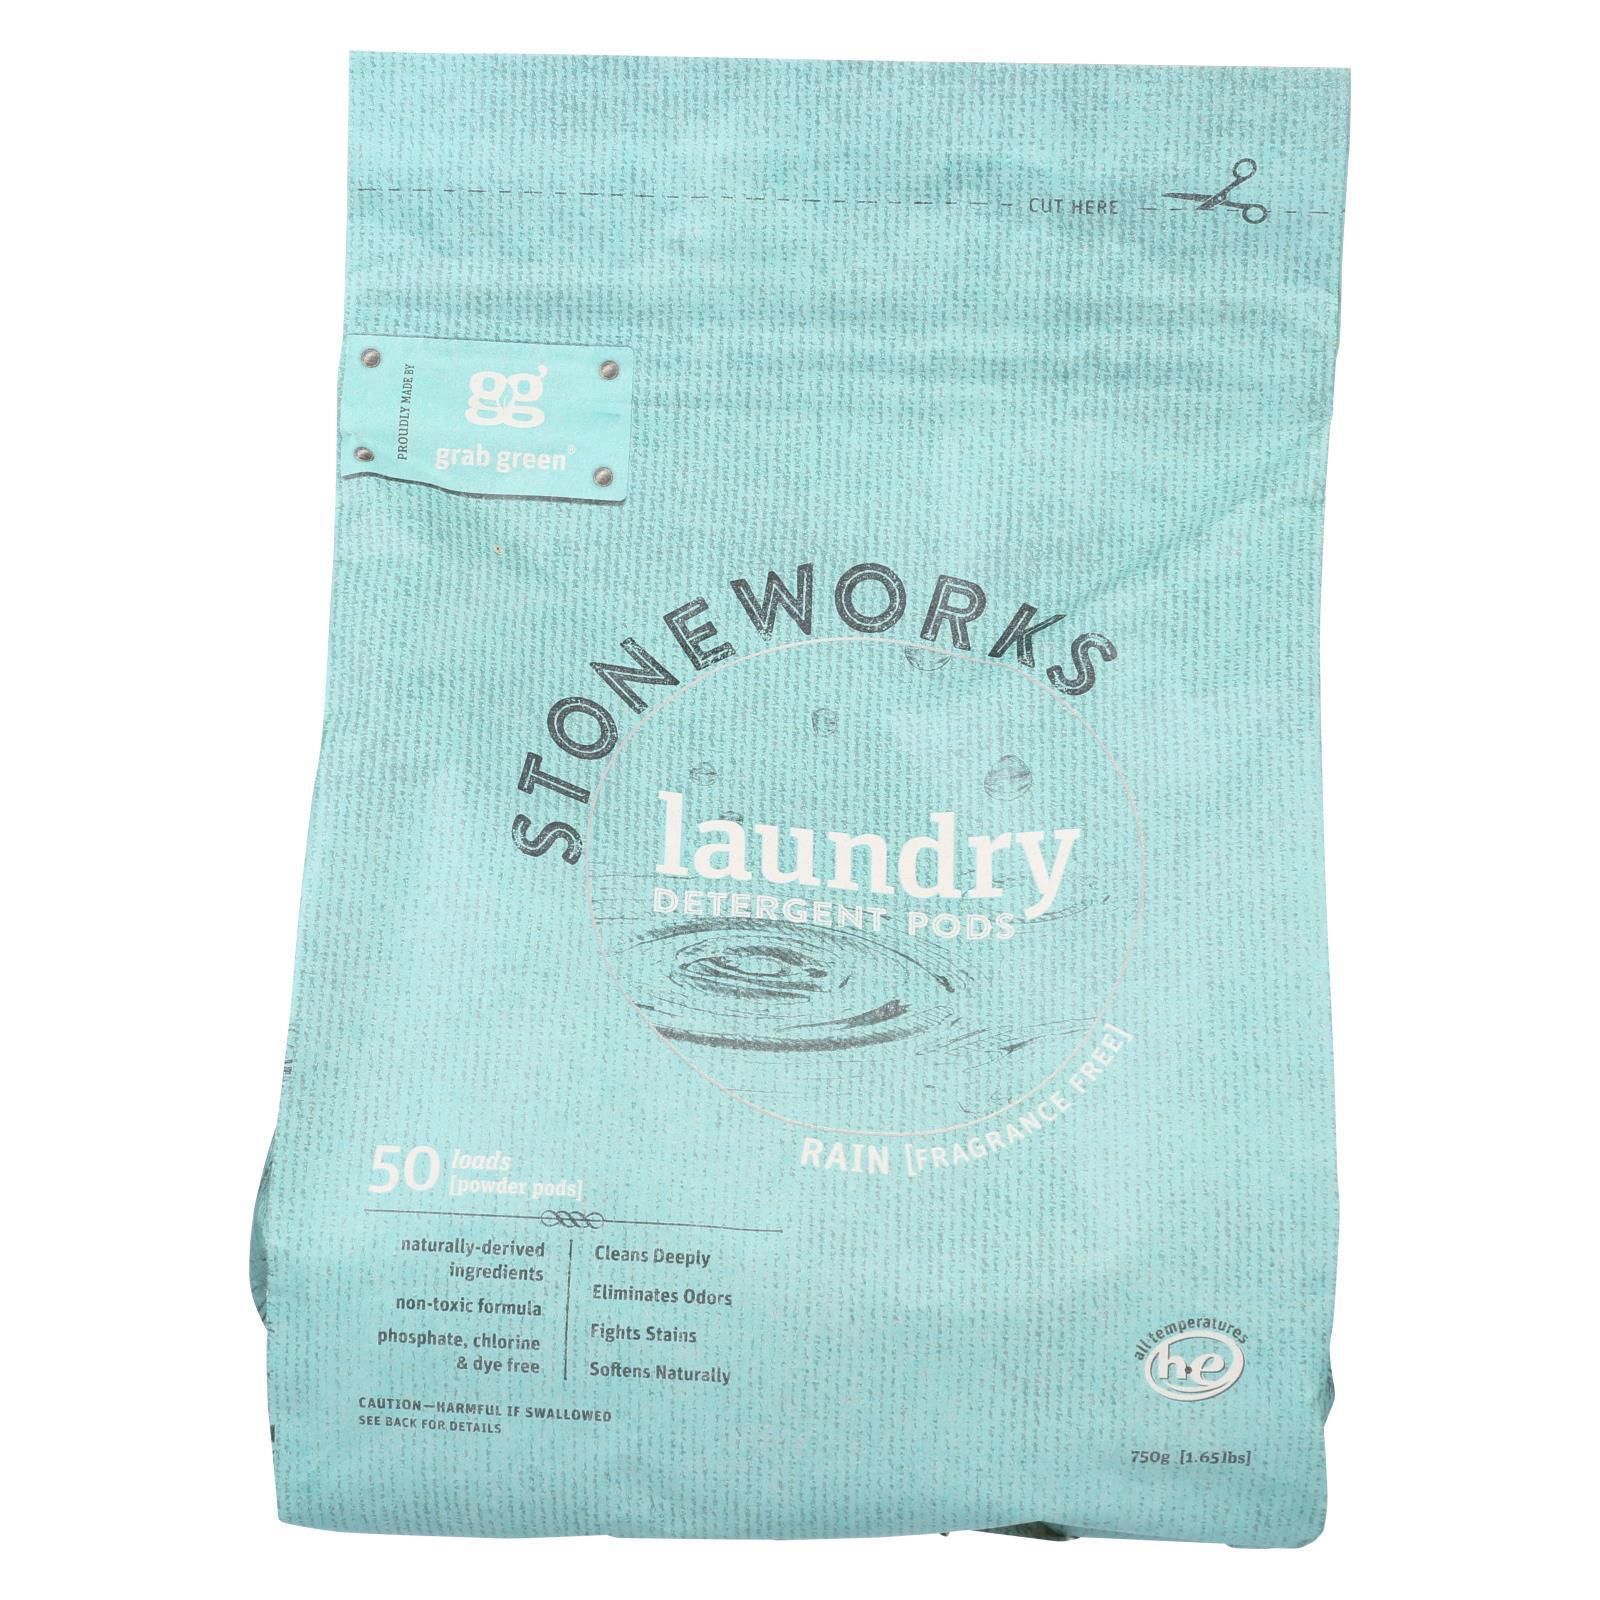 Stoneworks Laundry Detergent Pods - Rain - Case of 6 - 50 count